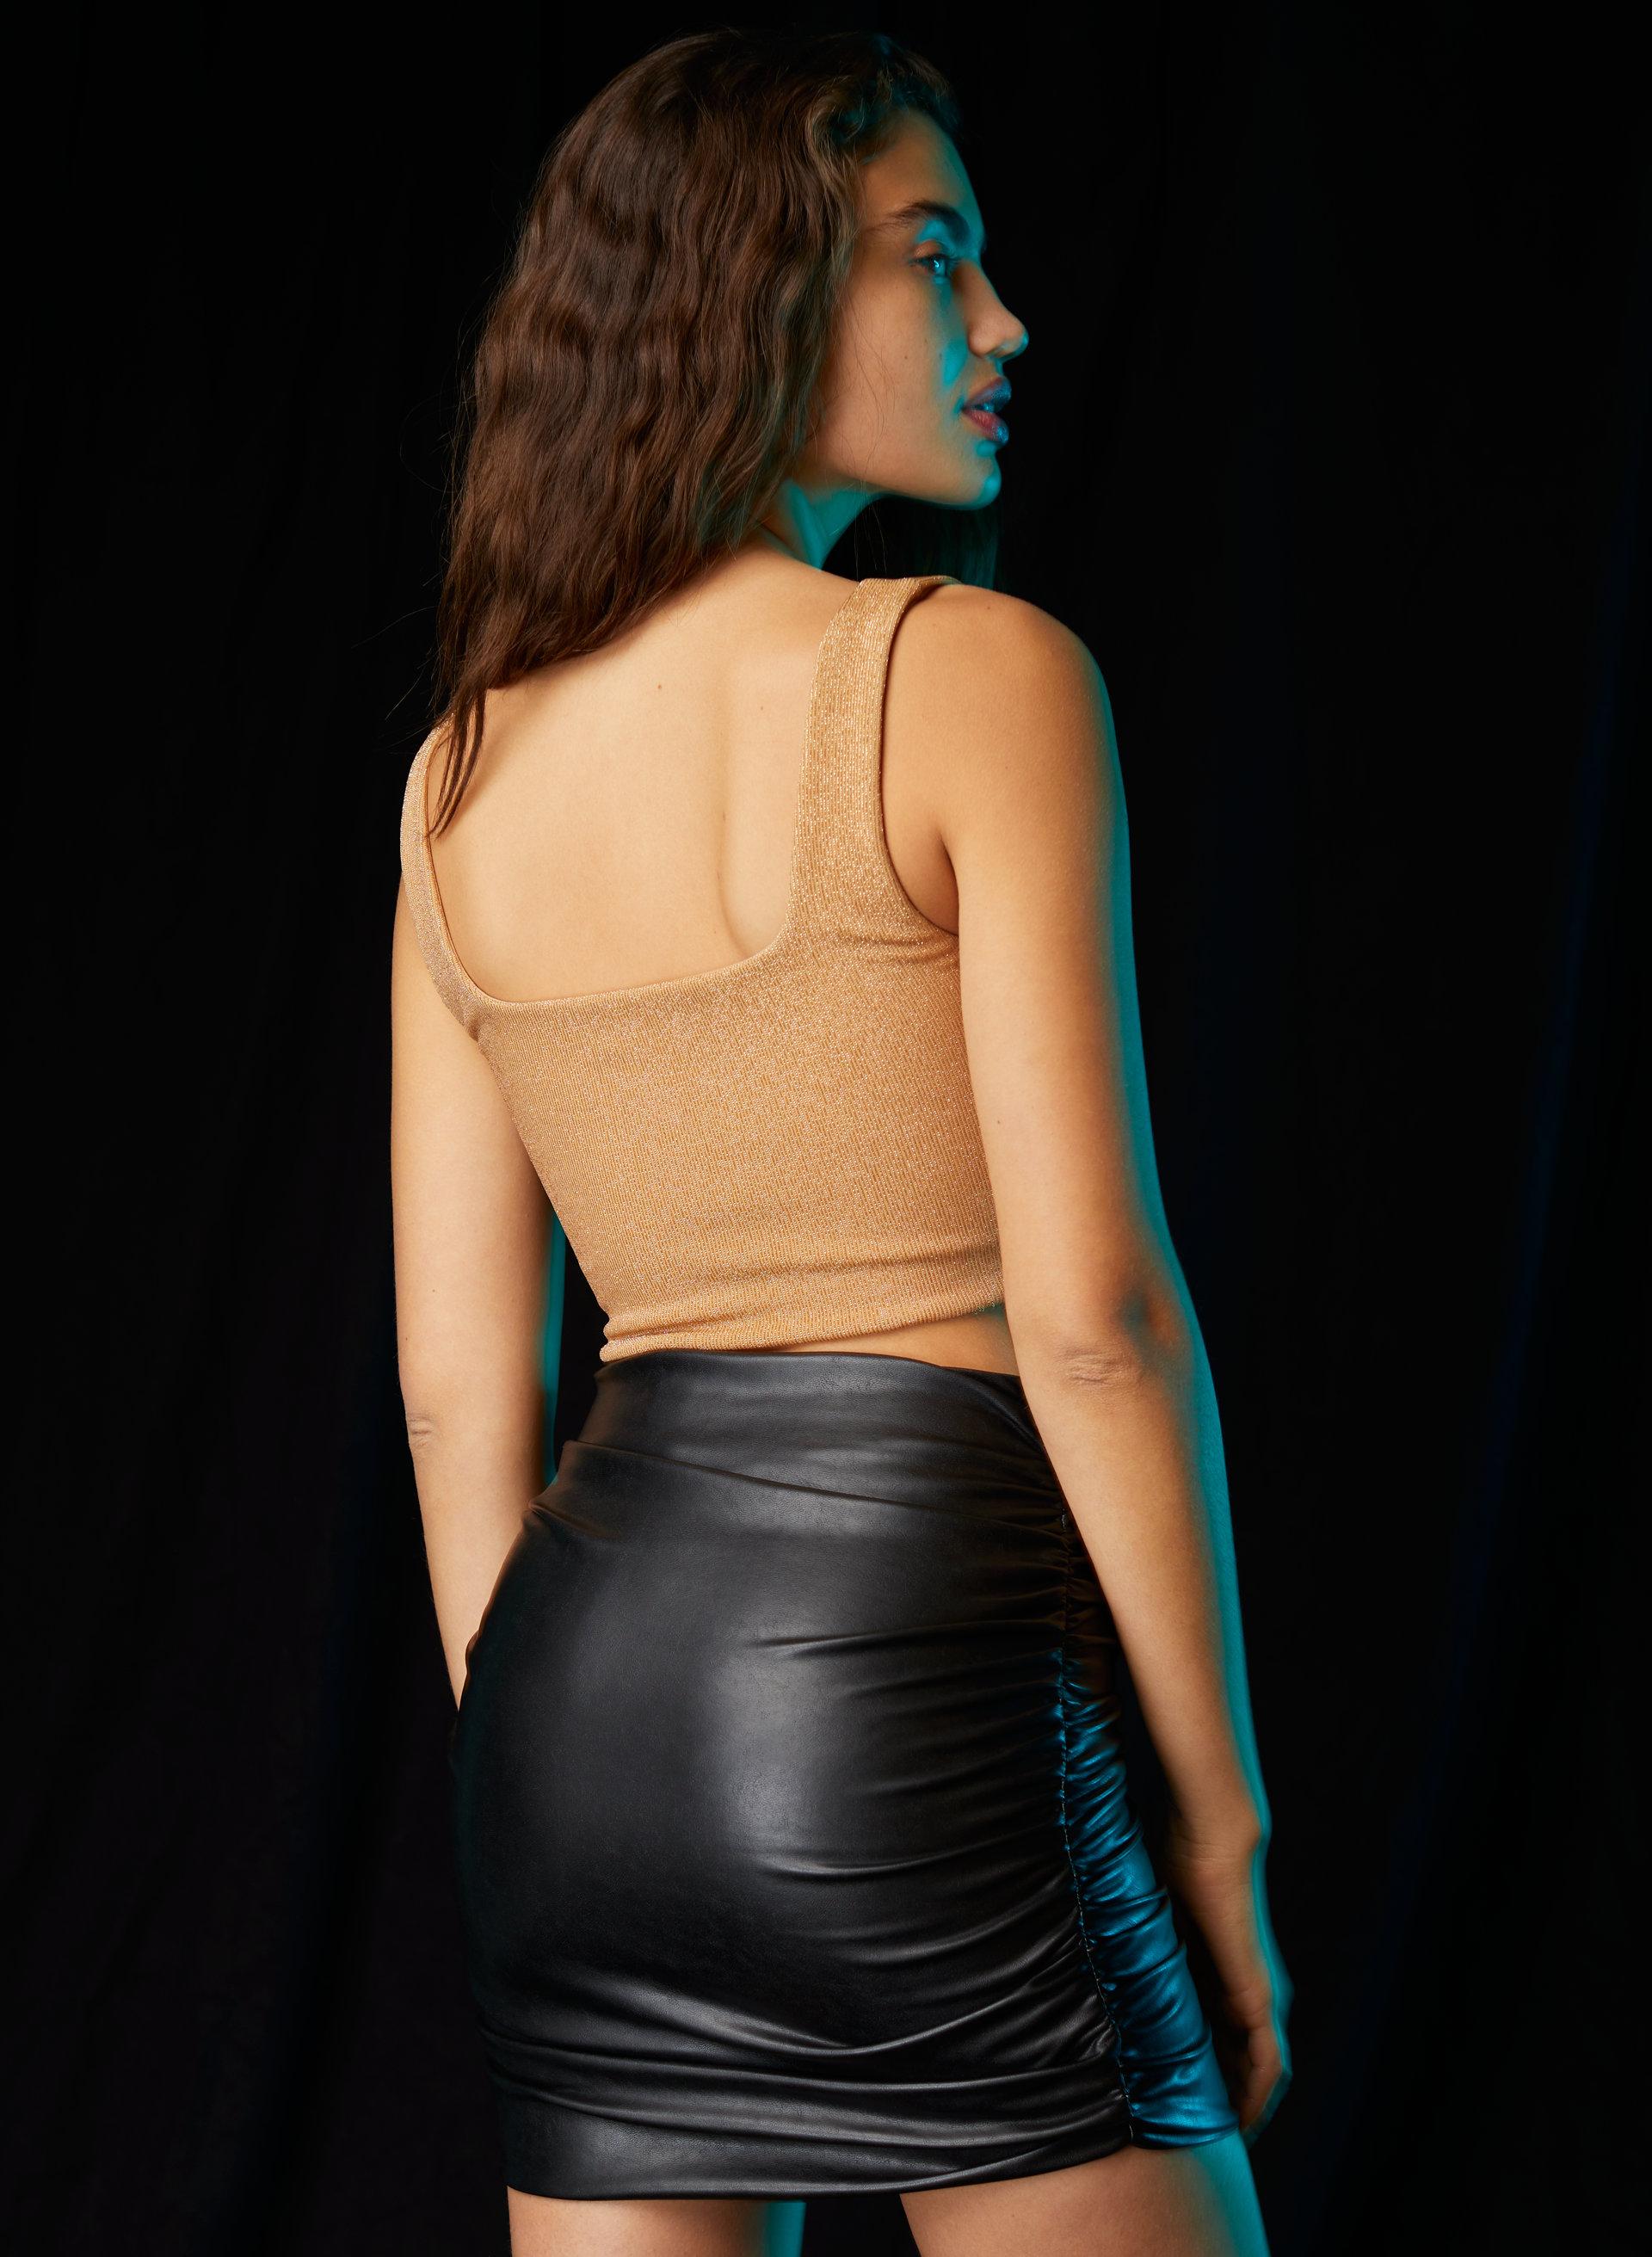 Alana Felisberto photoshoot for Aritzia